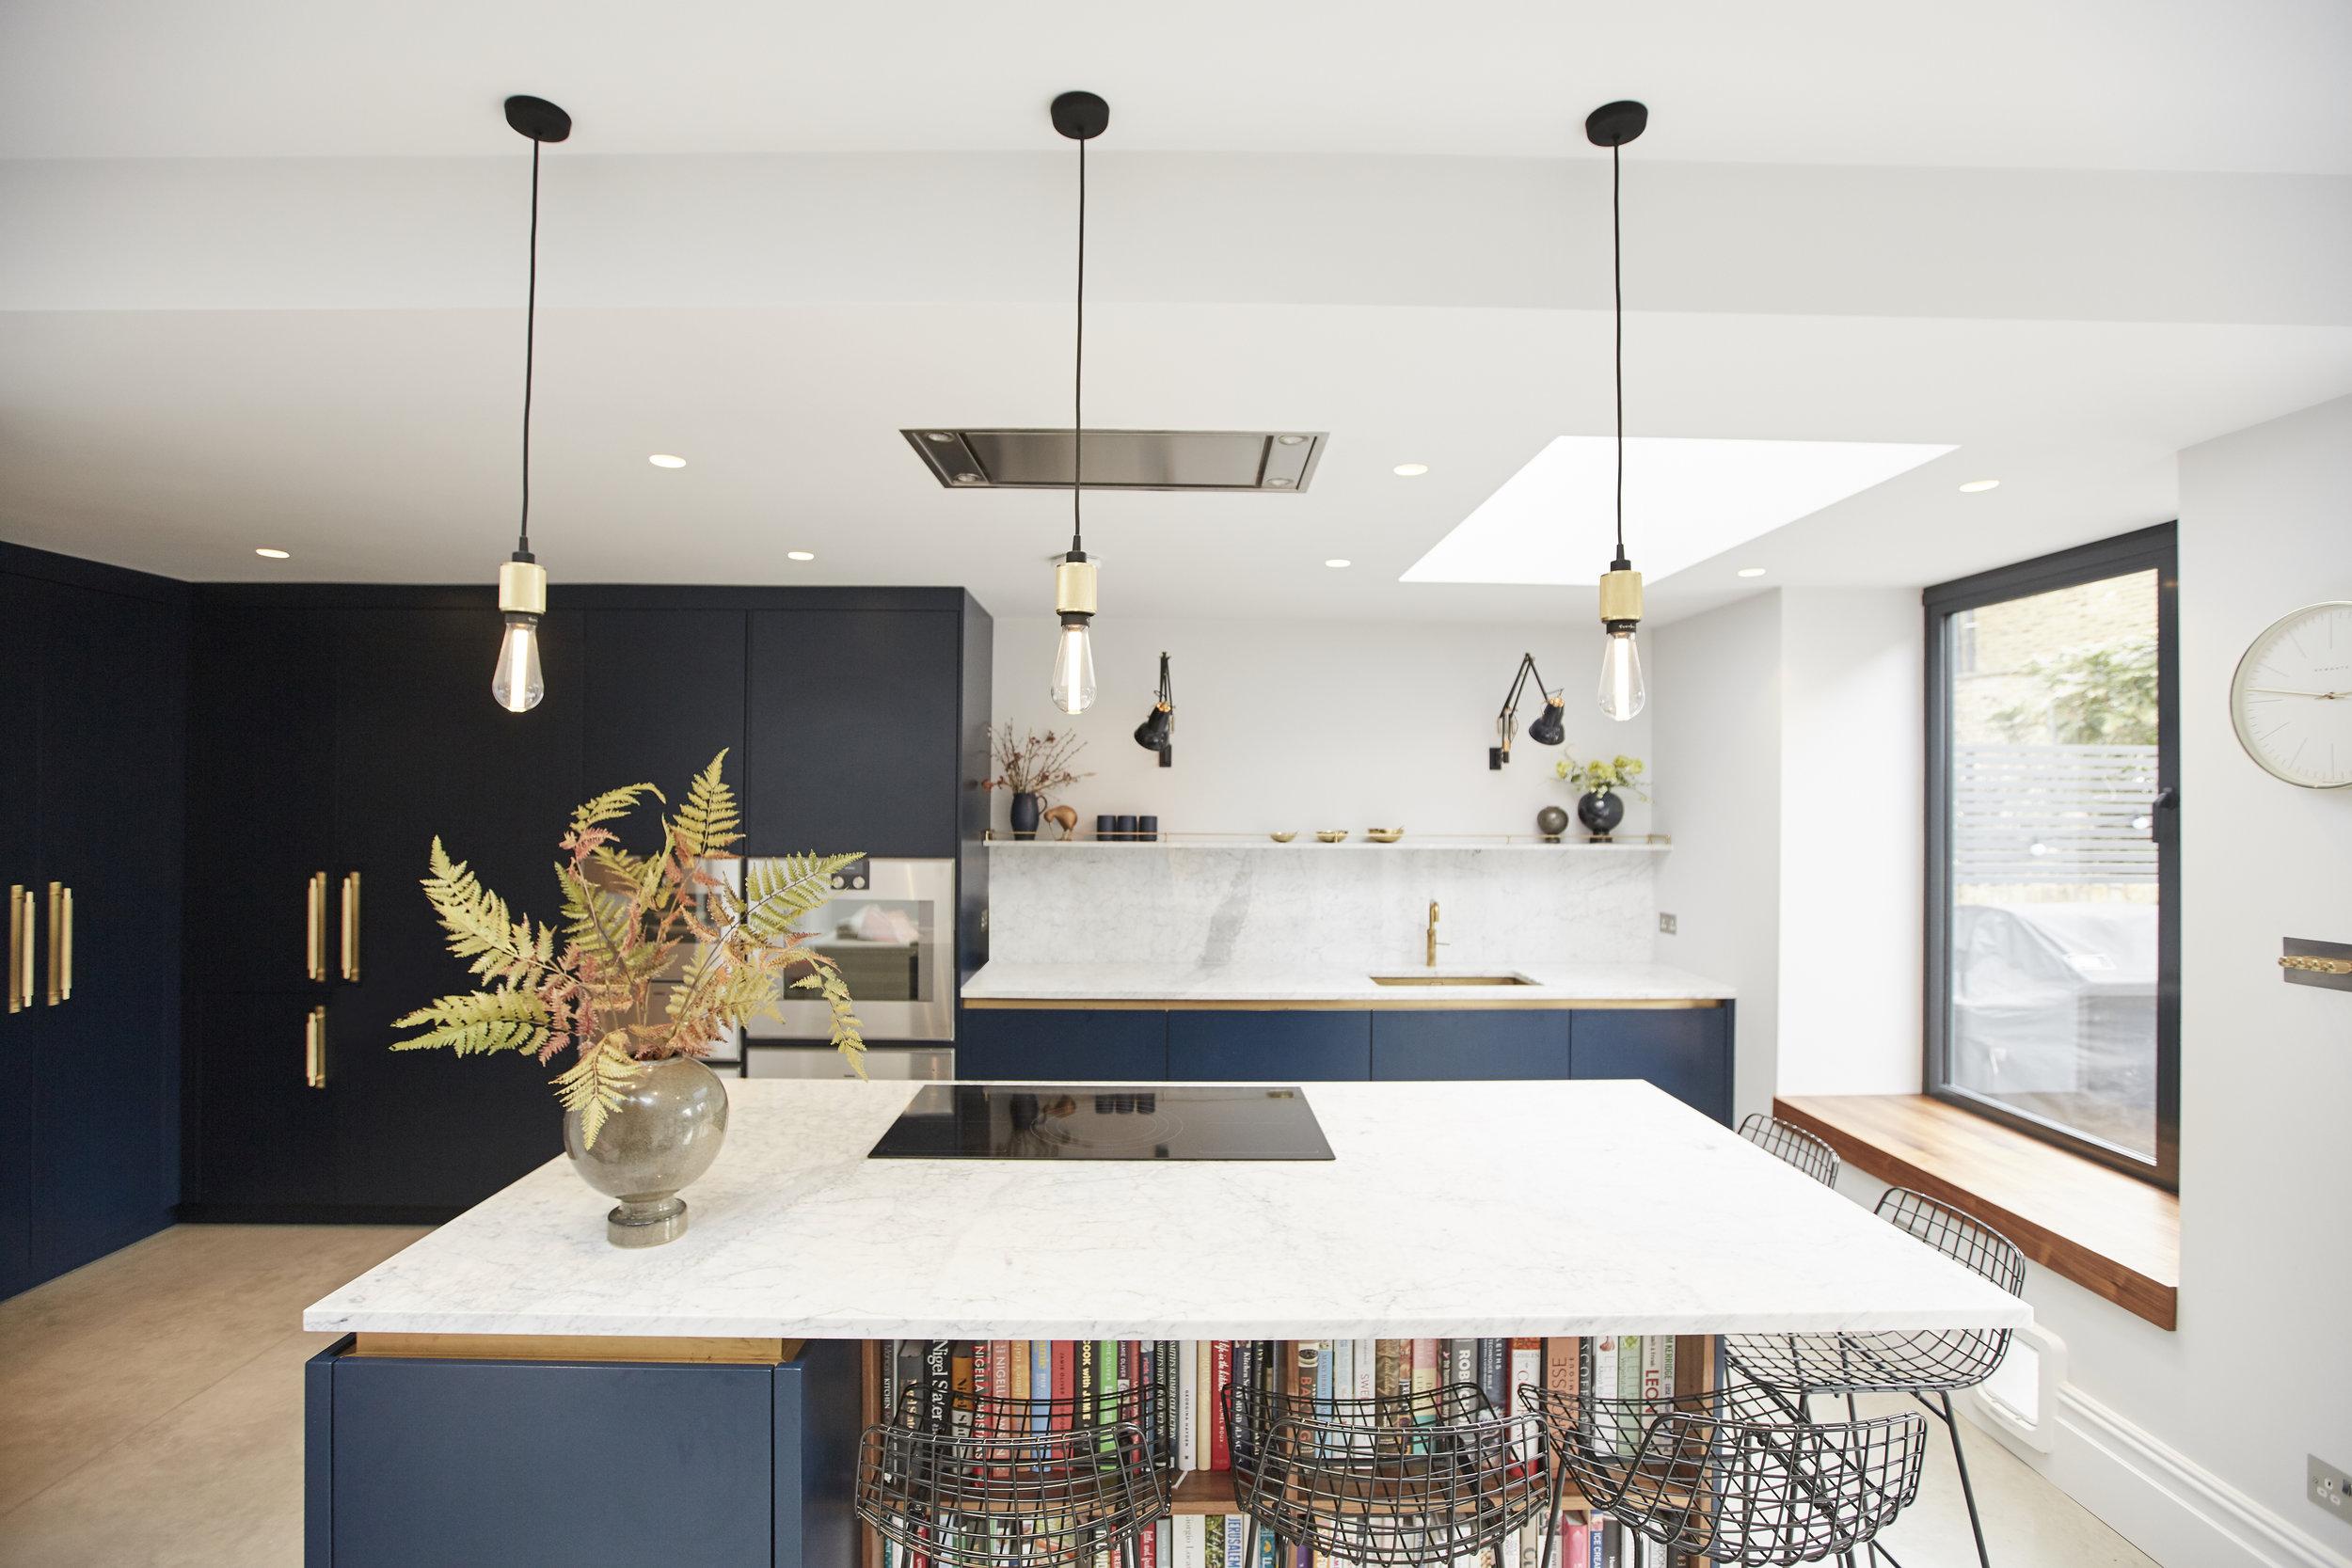 Glengarry kitchen